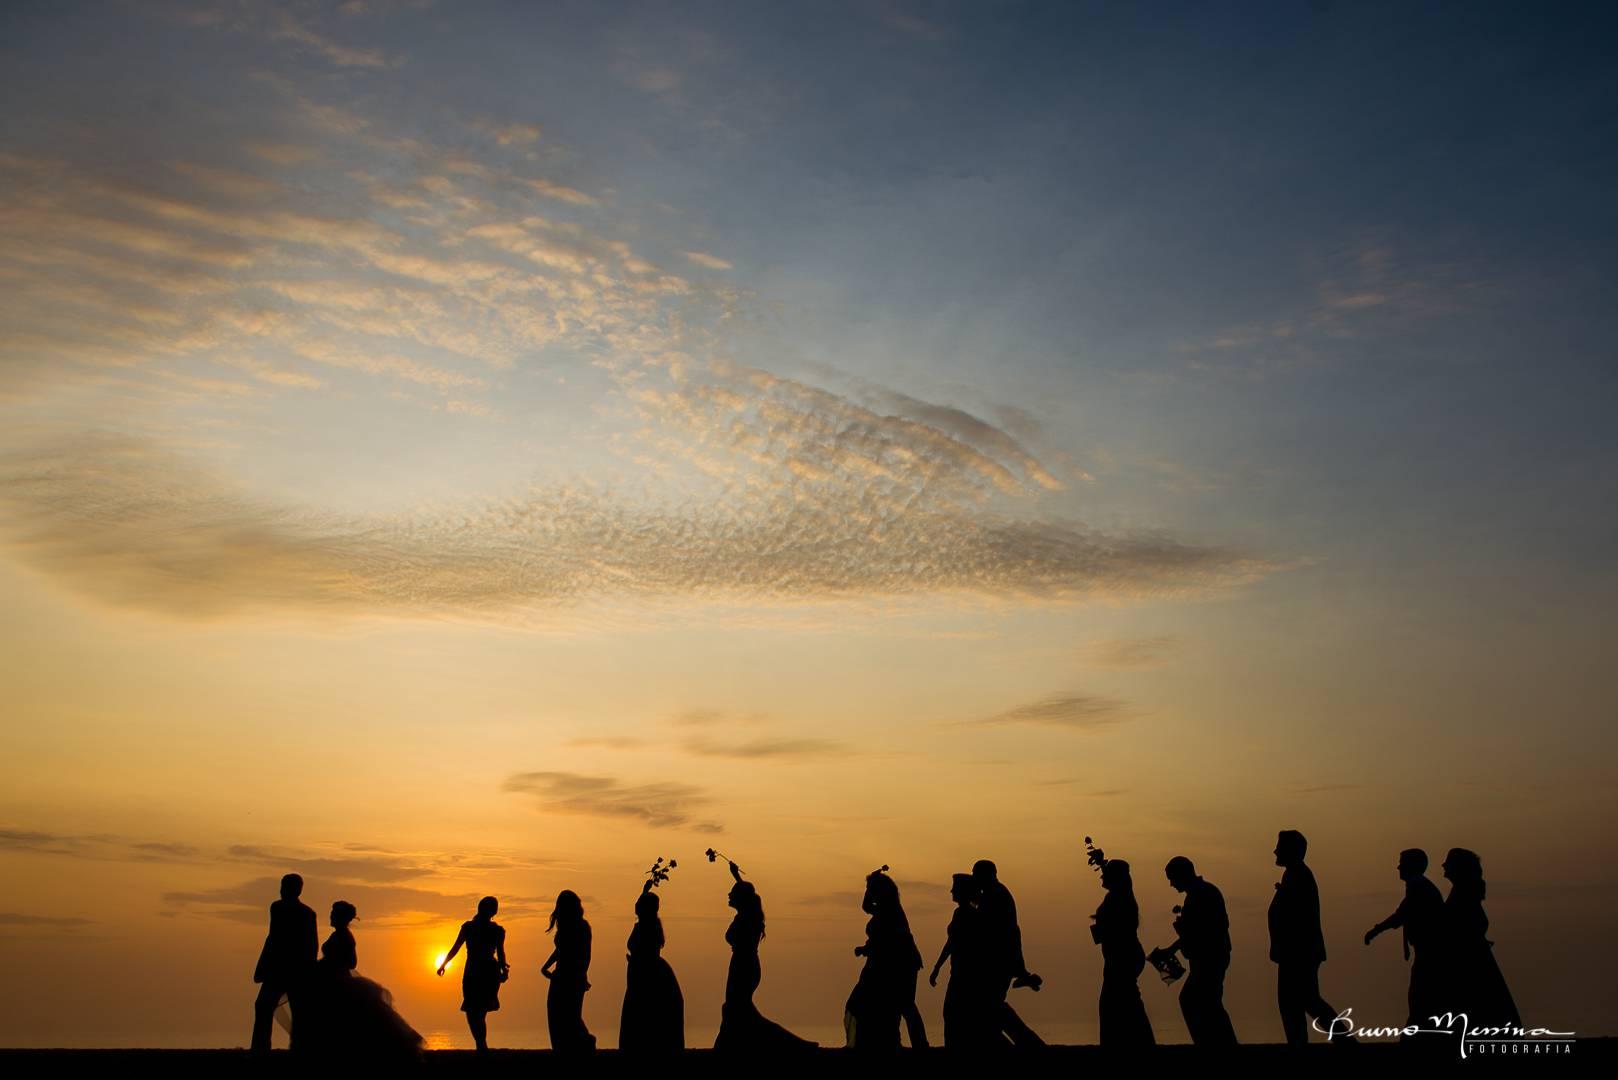 casamento-ao-ar-livre-casamento-na-praia-fotos-casamento-de-dia82